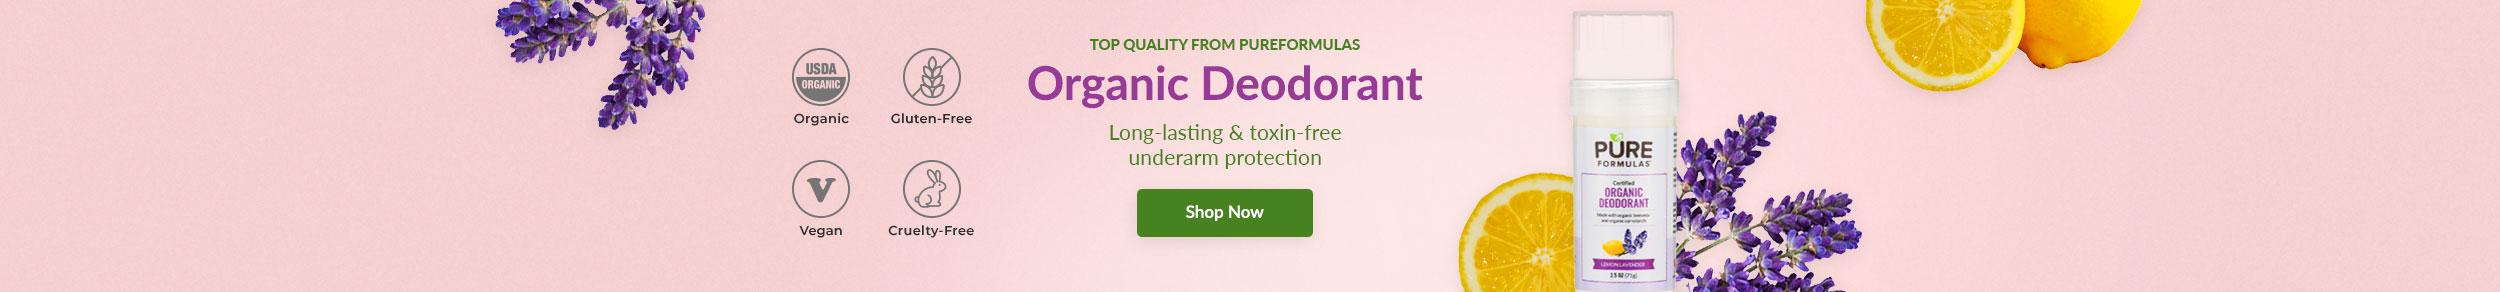 https://i3.pureformulas.net/images/static/pureformulas-beauty-deodorant_slide2_061218.jpg